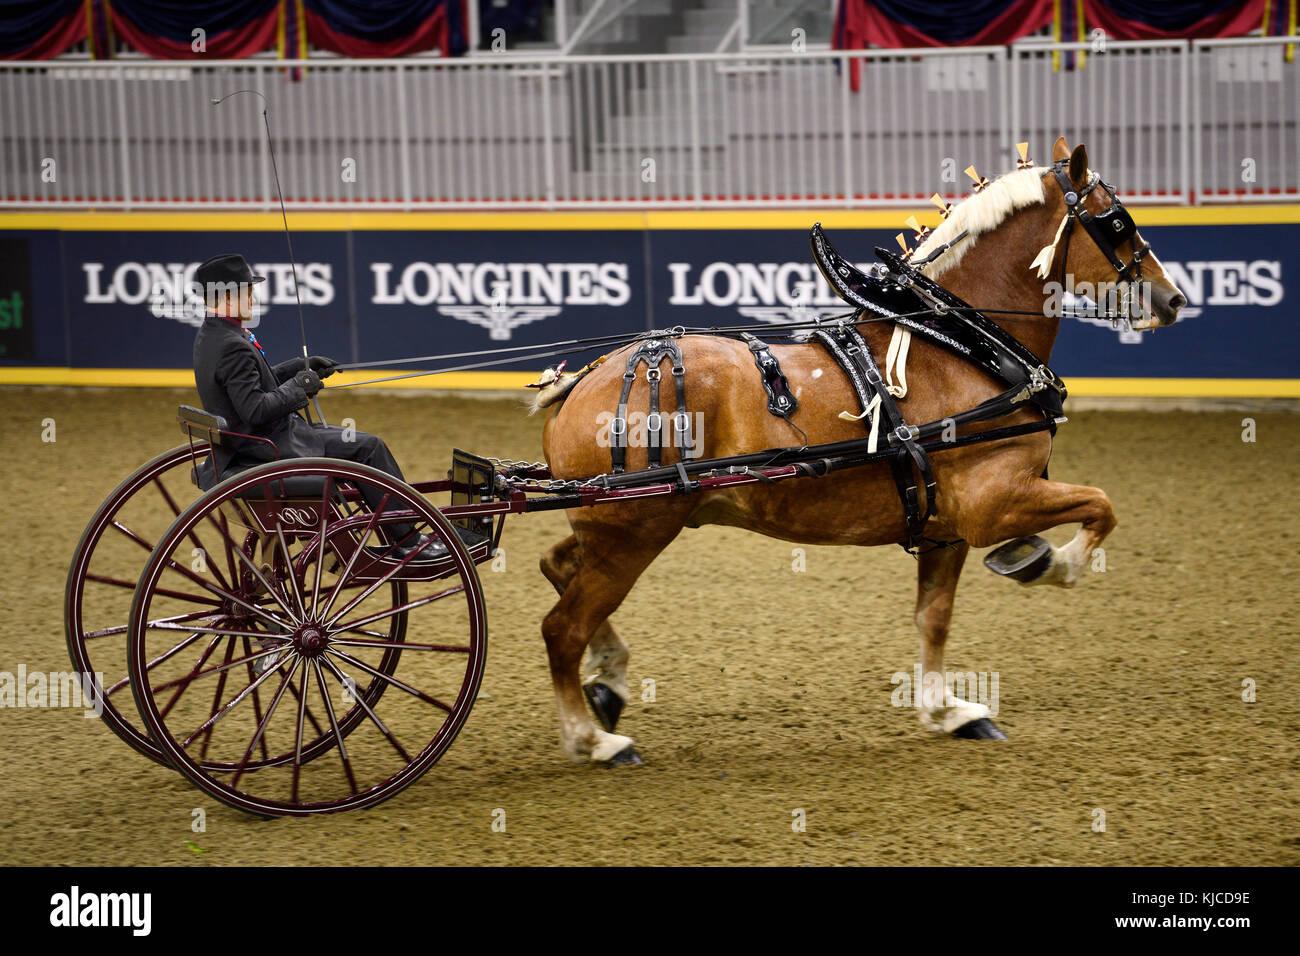 Kyle Forsyth driving draft horse cart at NASHHCS Classic Cart Series at the Royal Horse Show Ricoh Coliseum Toronto - Stock Image